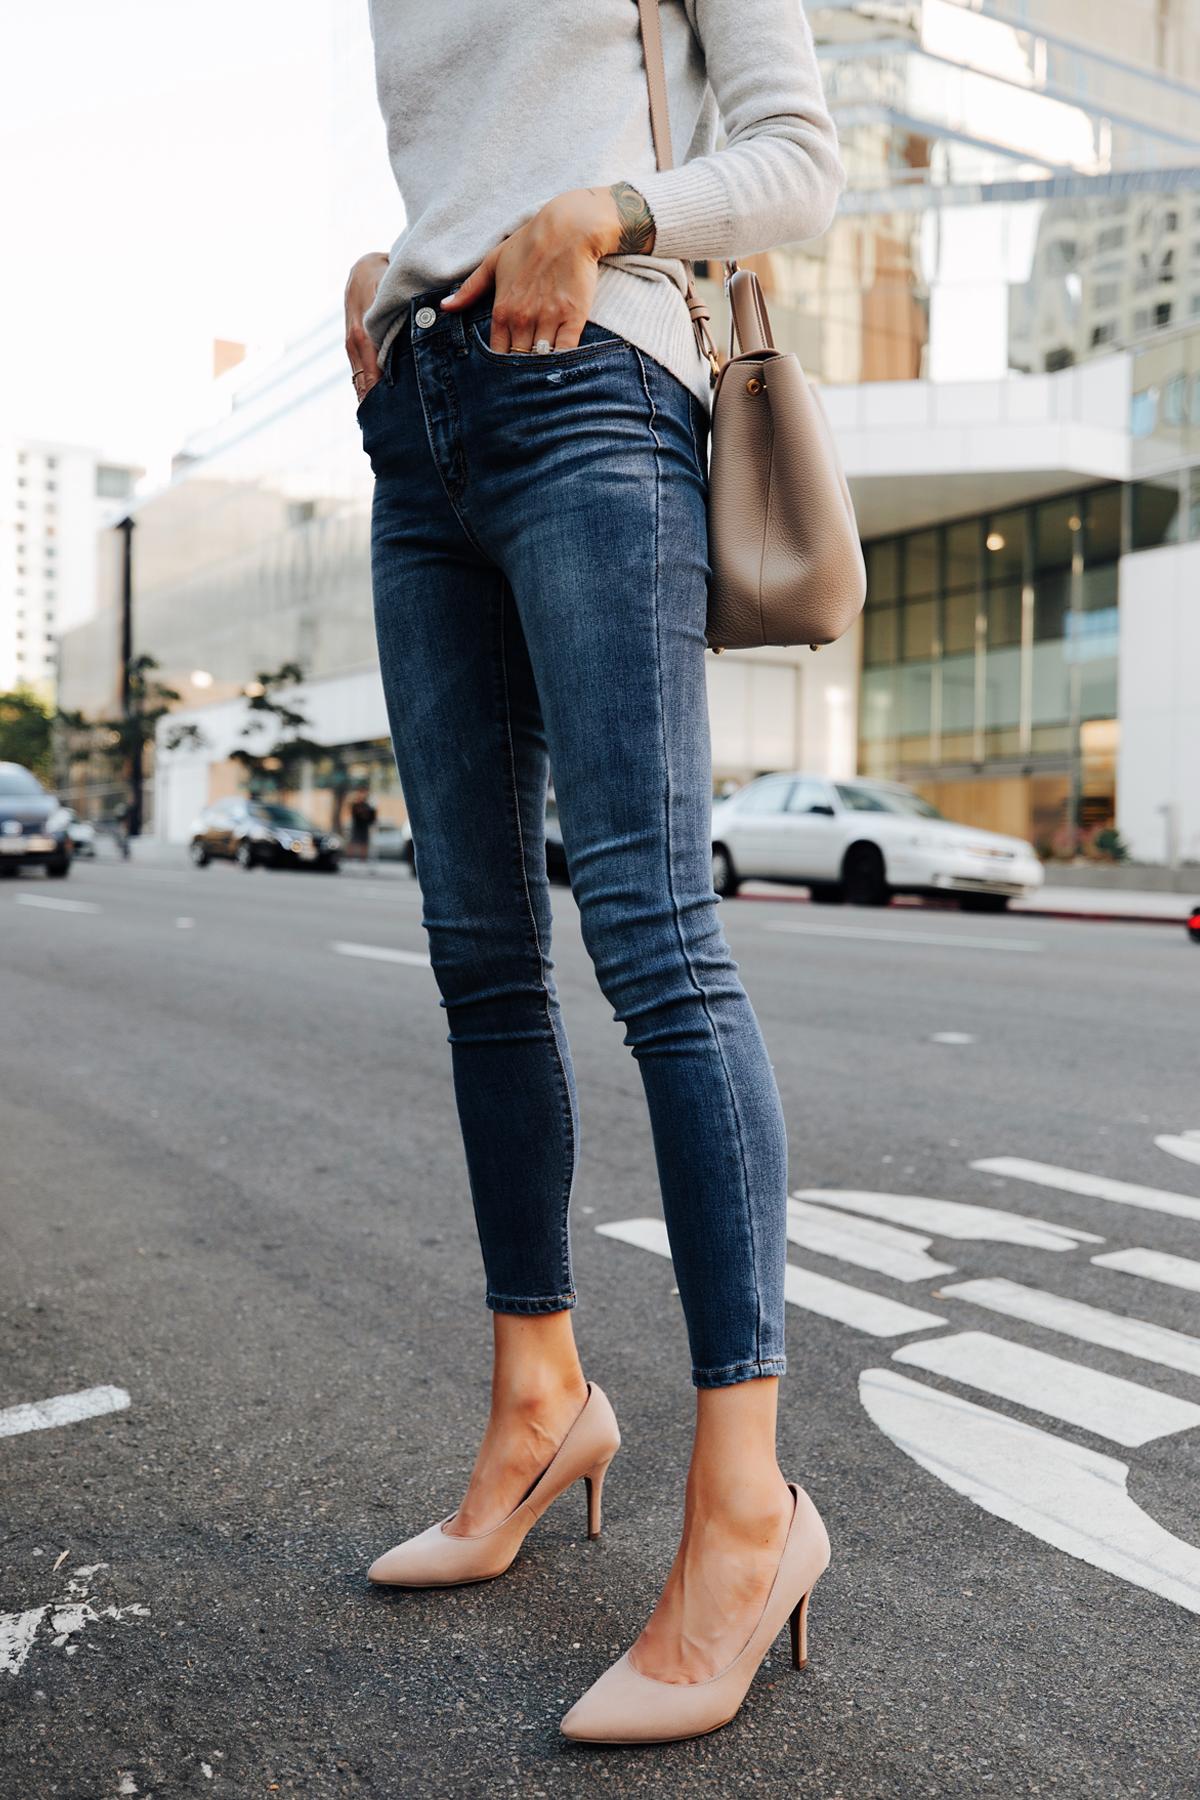 Fashion Jackson Wearing Walmart Grey Sweater Walmart Denim Skinny Jeans Nude Pumps